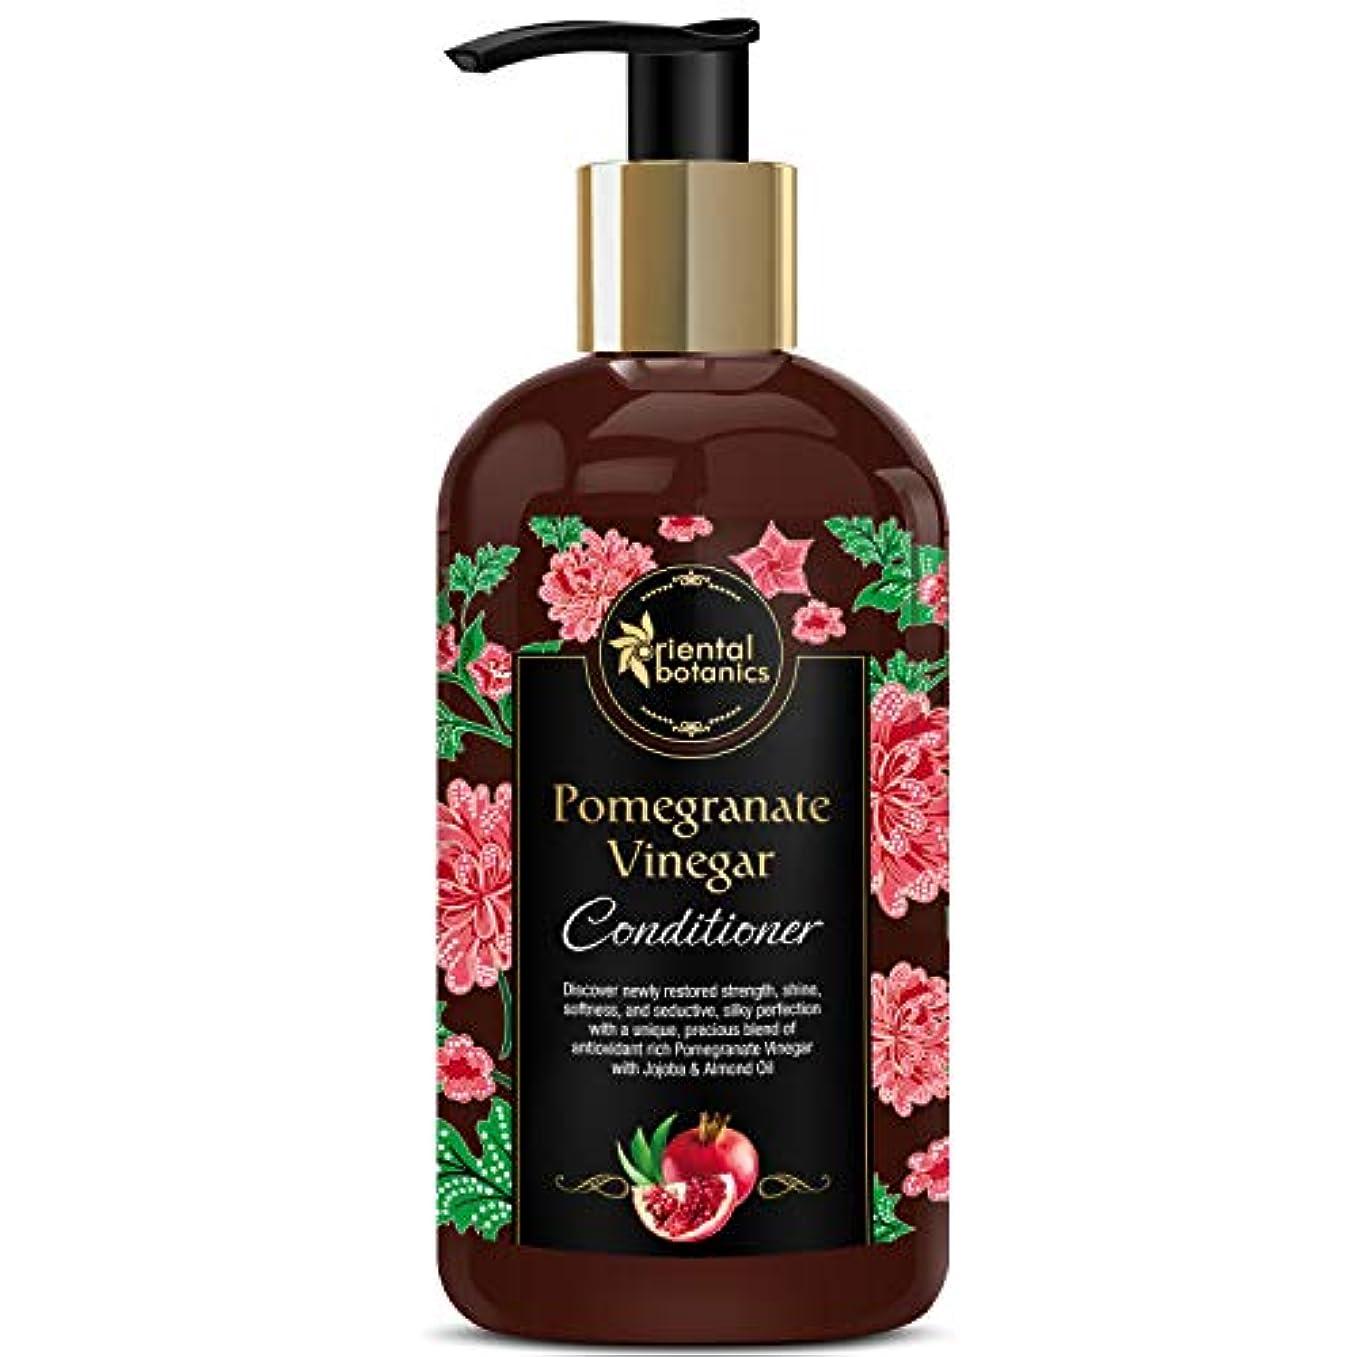 Oriental Botanics Pomegranate Vinegar Conditioner - For Healthy, Strong Hair with Antioxidant Boost & Golden Jojoba...